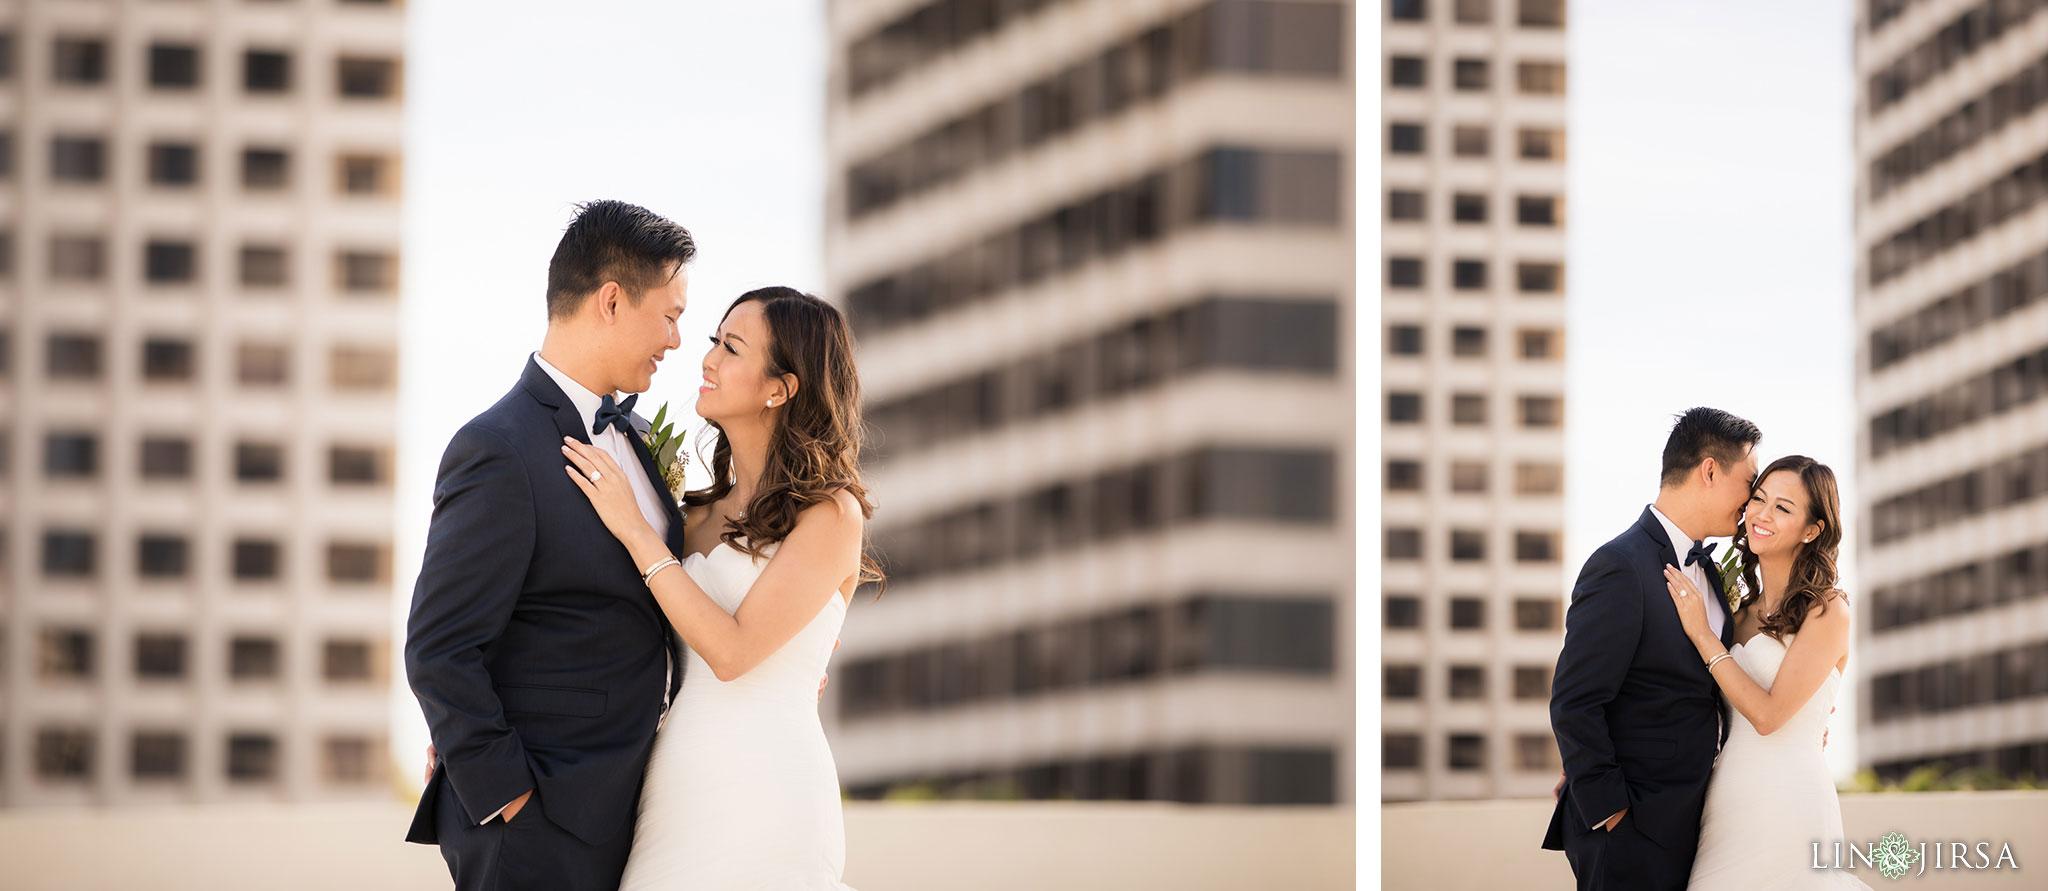 26 hotel irvine orange county wedding photography